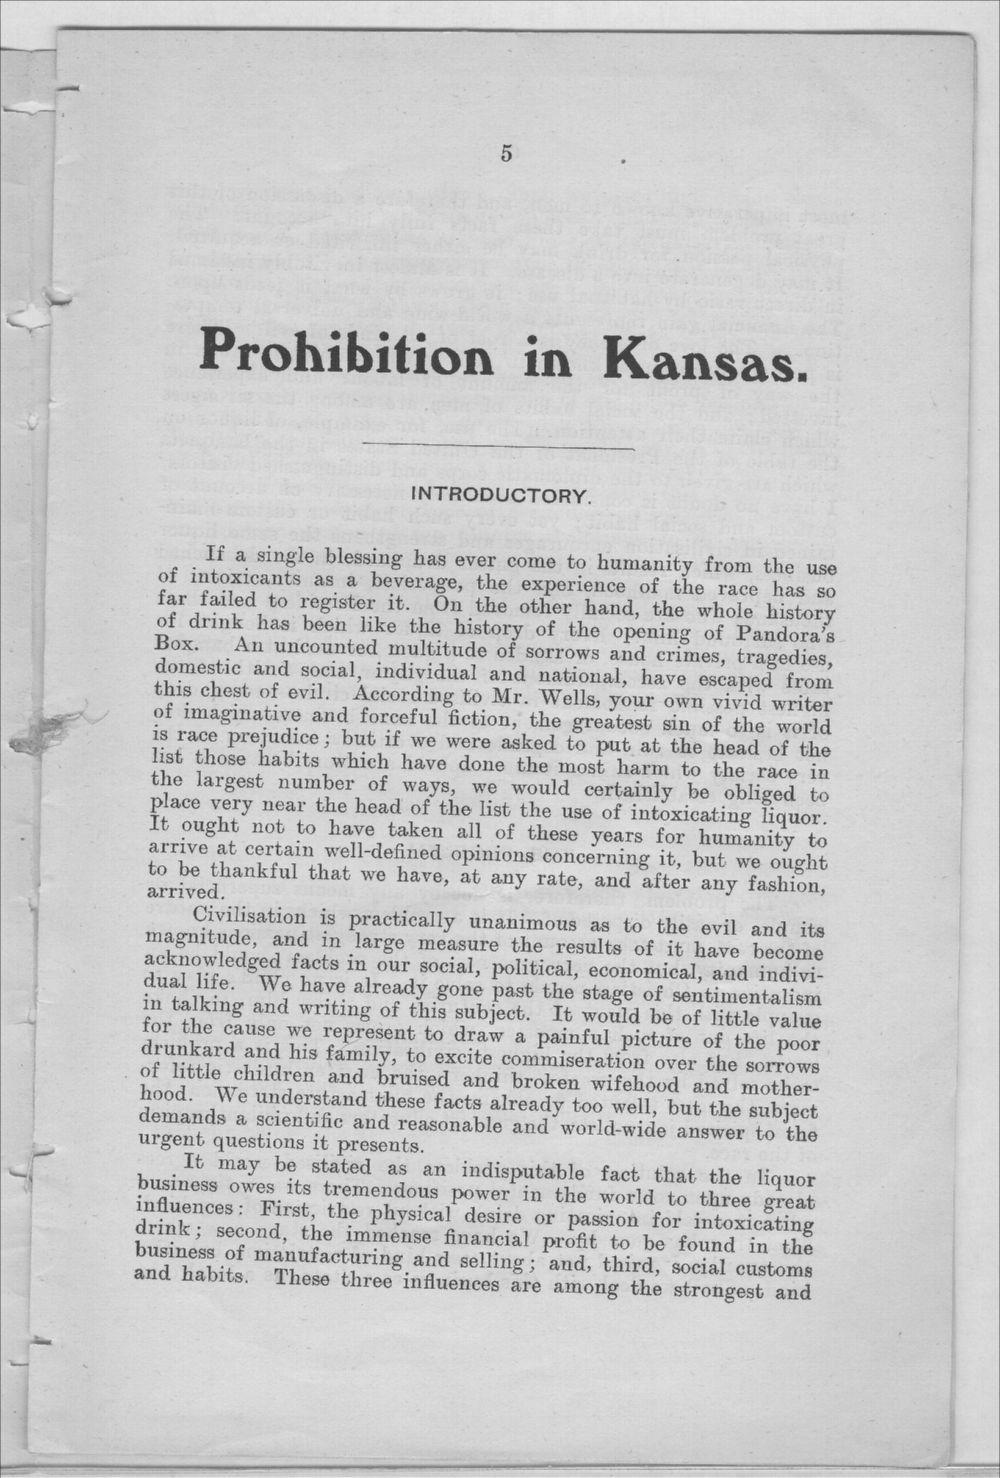 Prohibition in Kansas, U.S.A. - 5